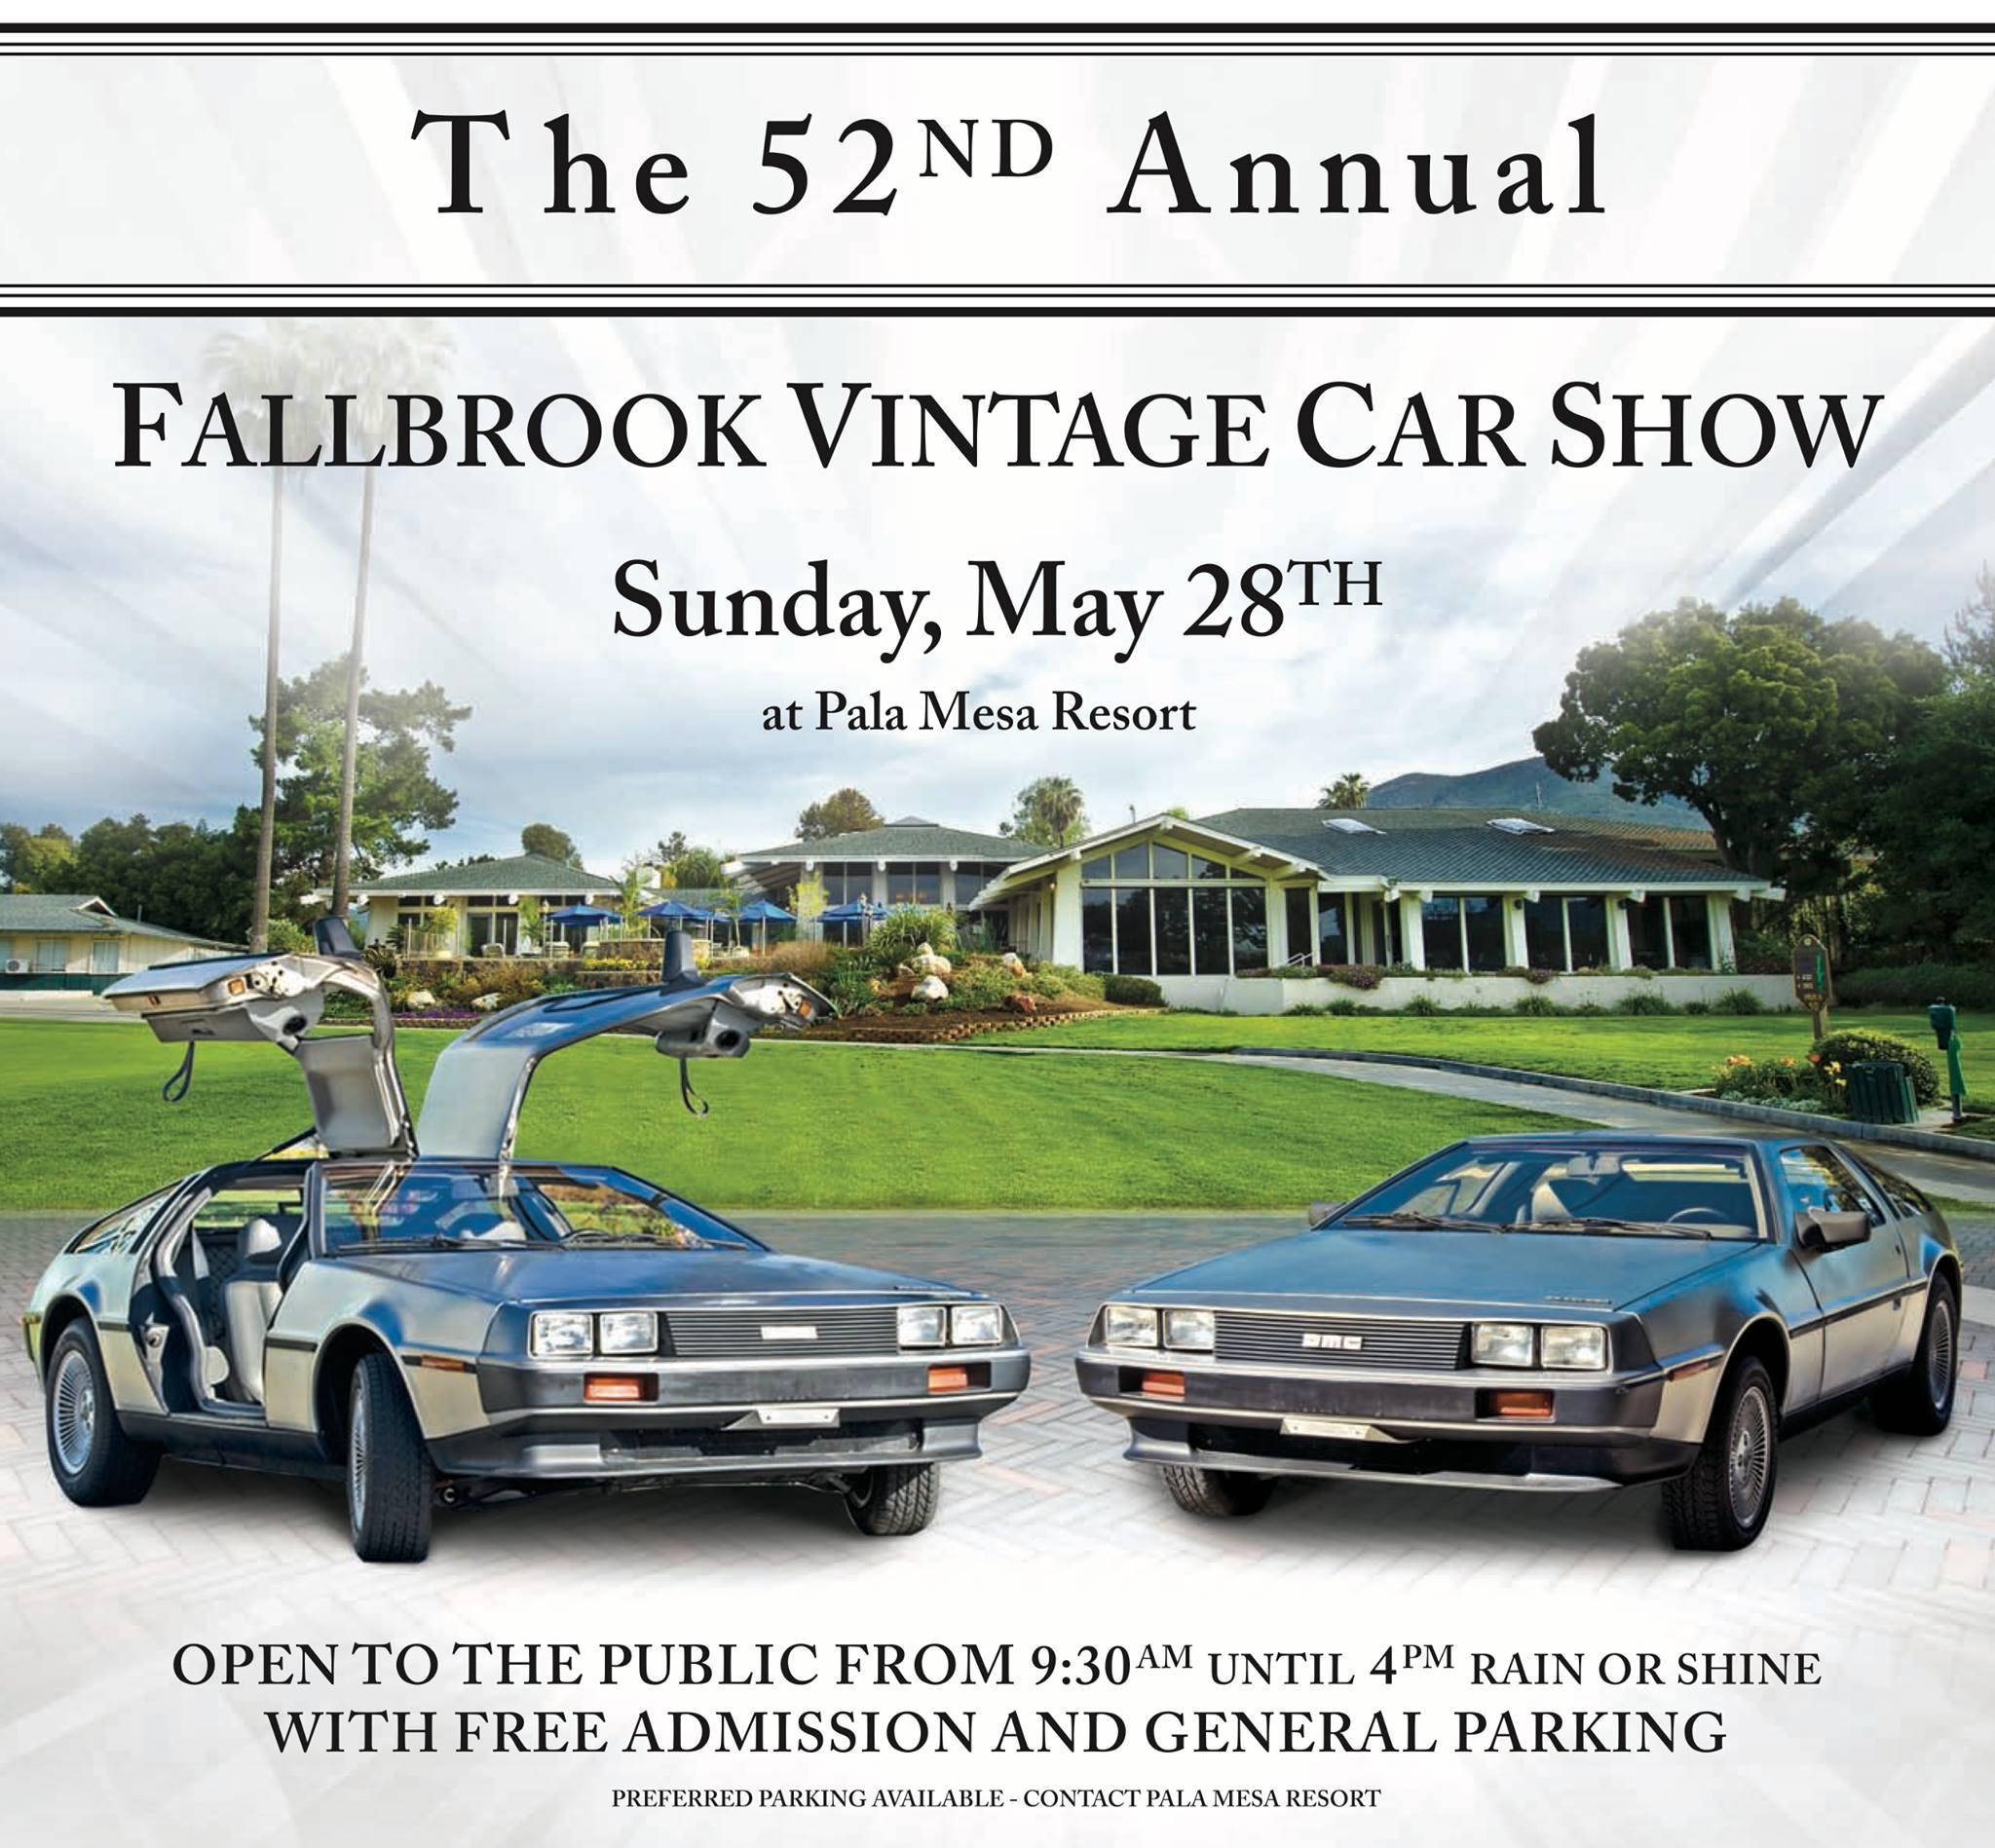 52nd Annual Fallbrook Vintage Car Show – DeLorean Club – Southern ...